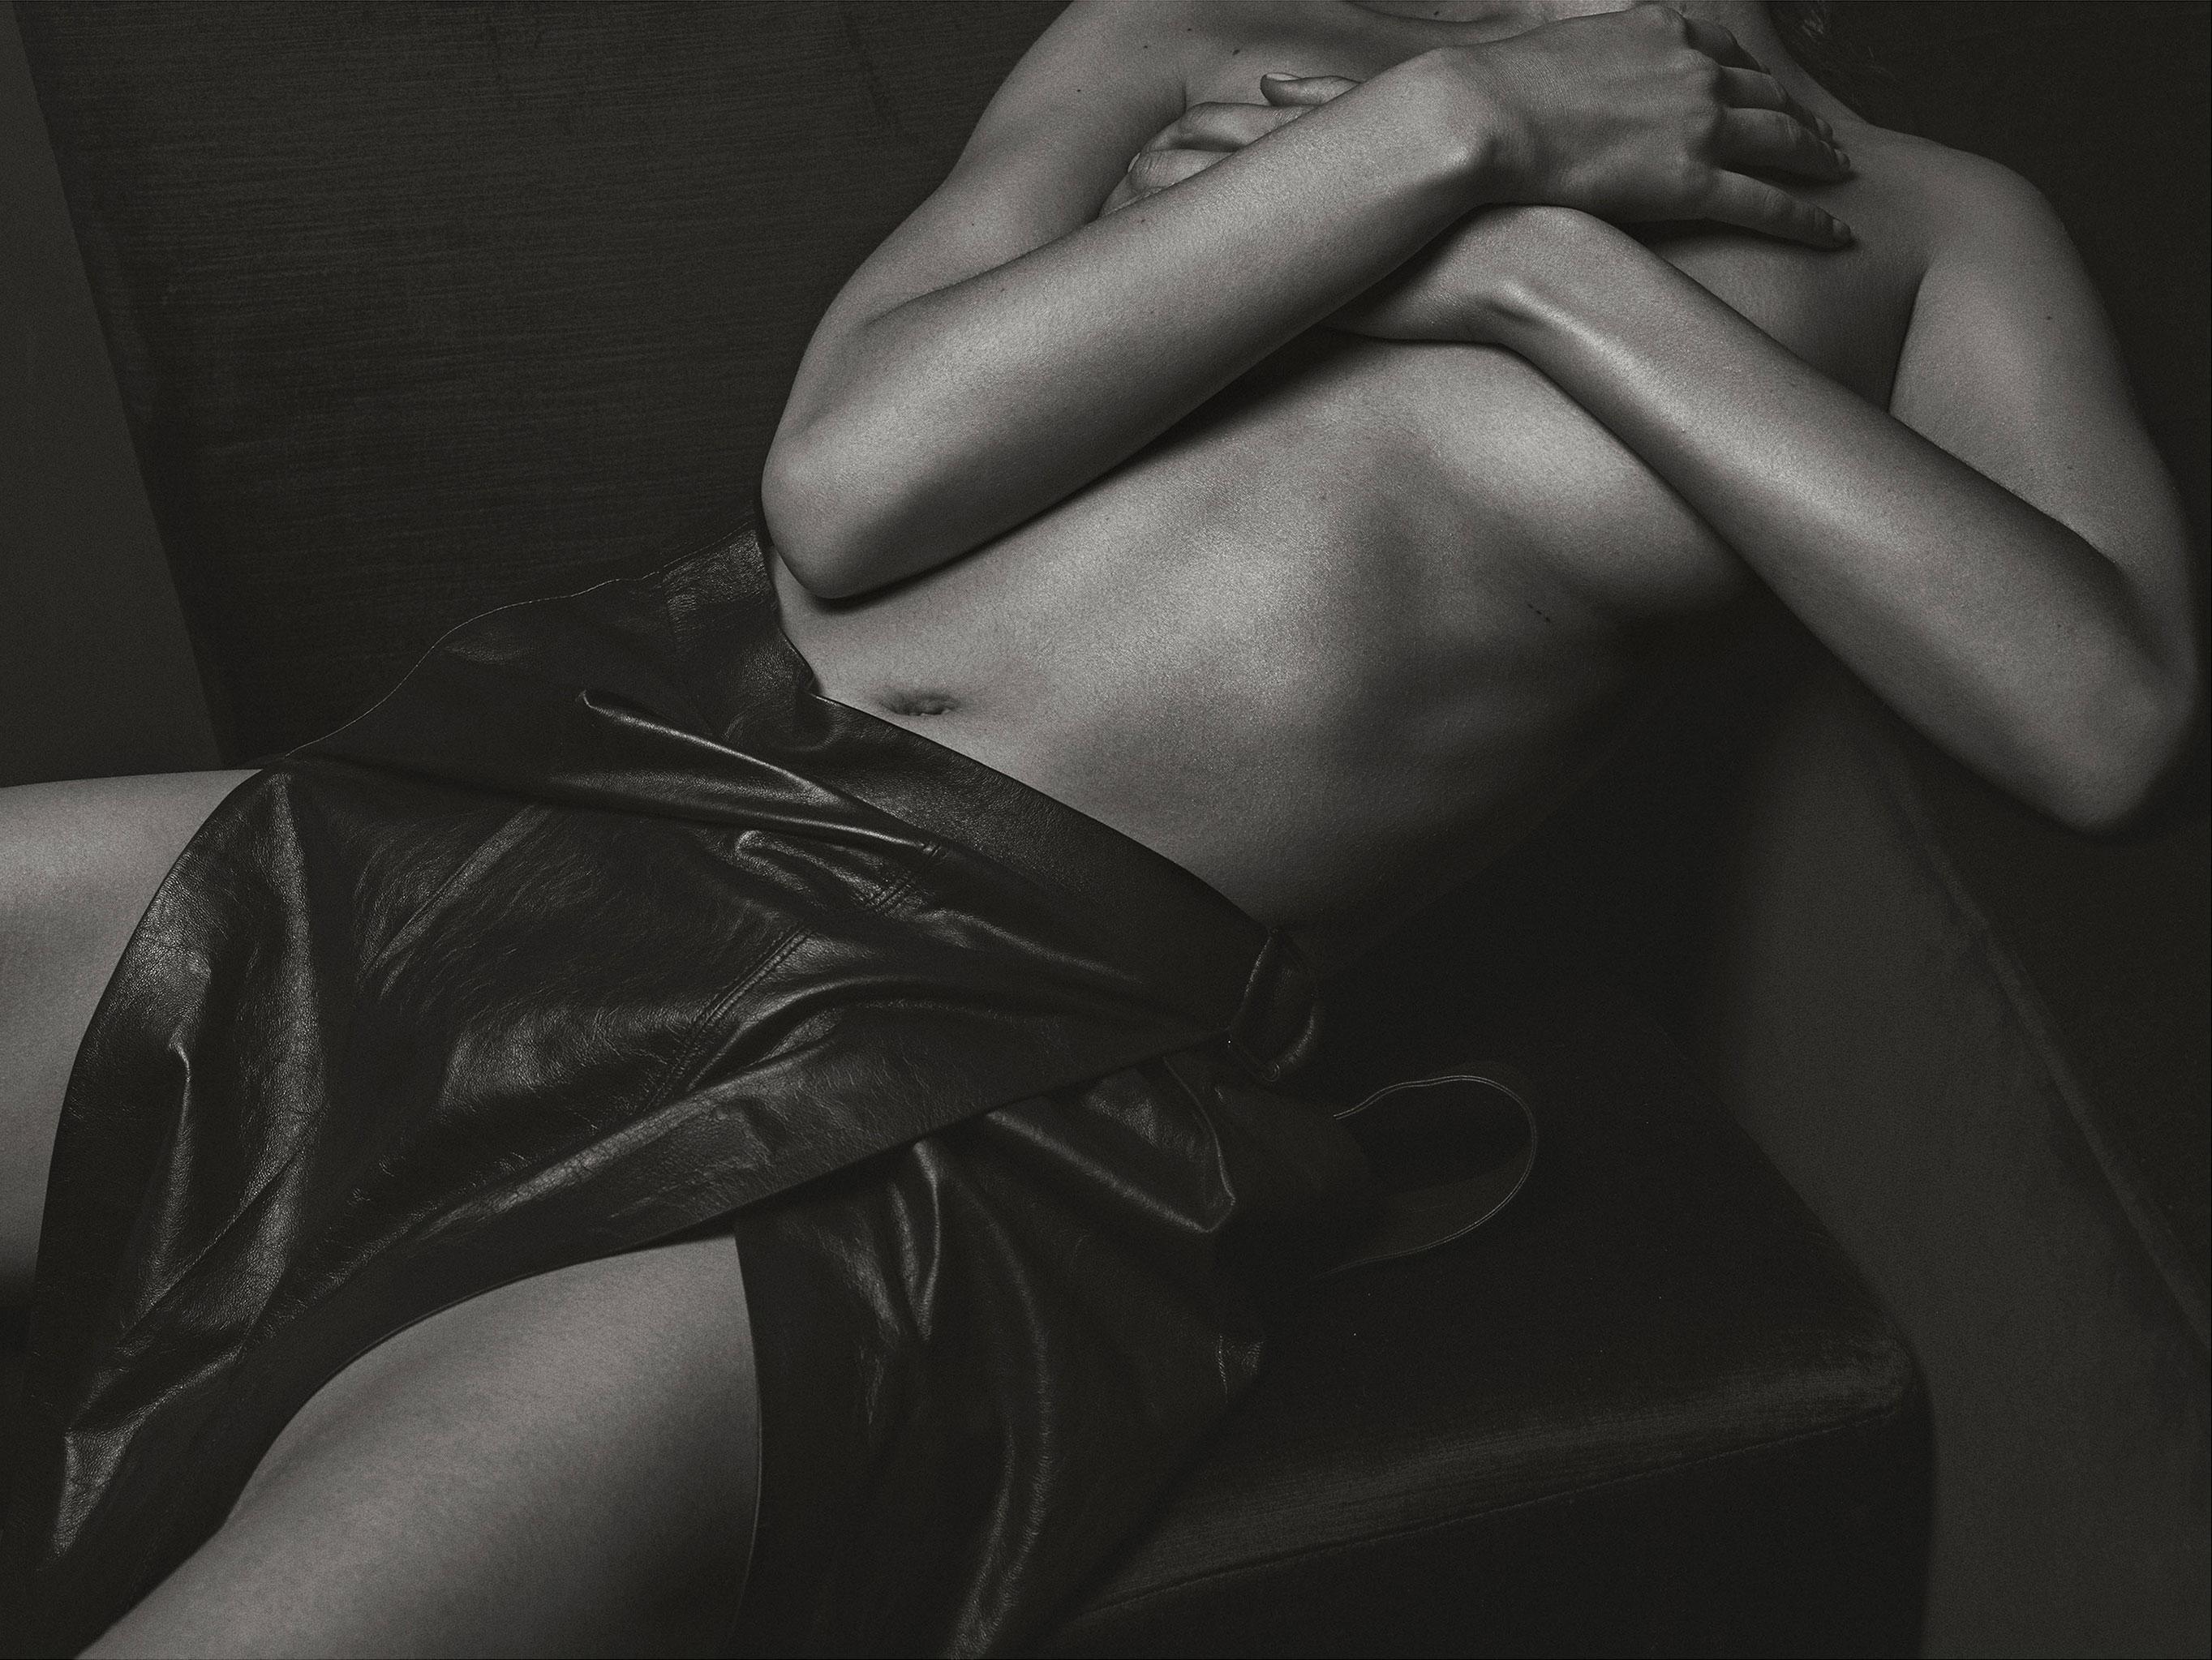 Белла Хадид / Bella Hadid nude by Mario Sorrenti - V Magazine spring 2017